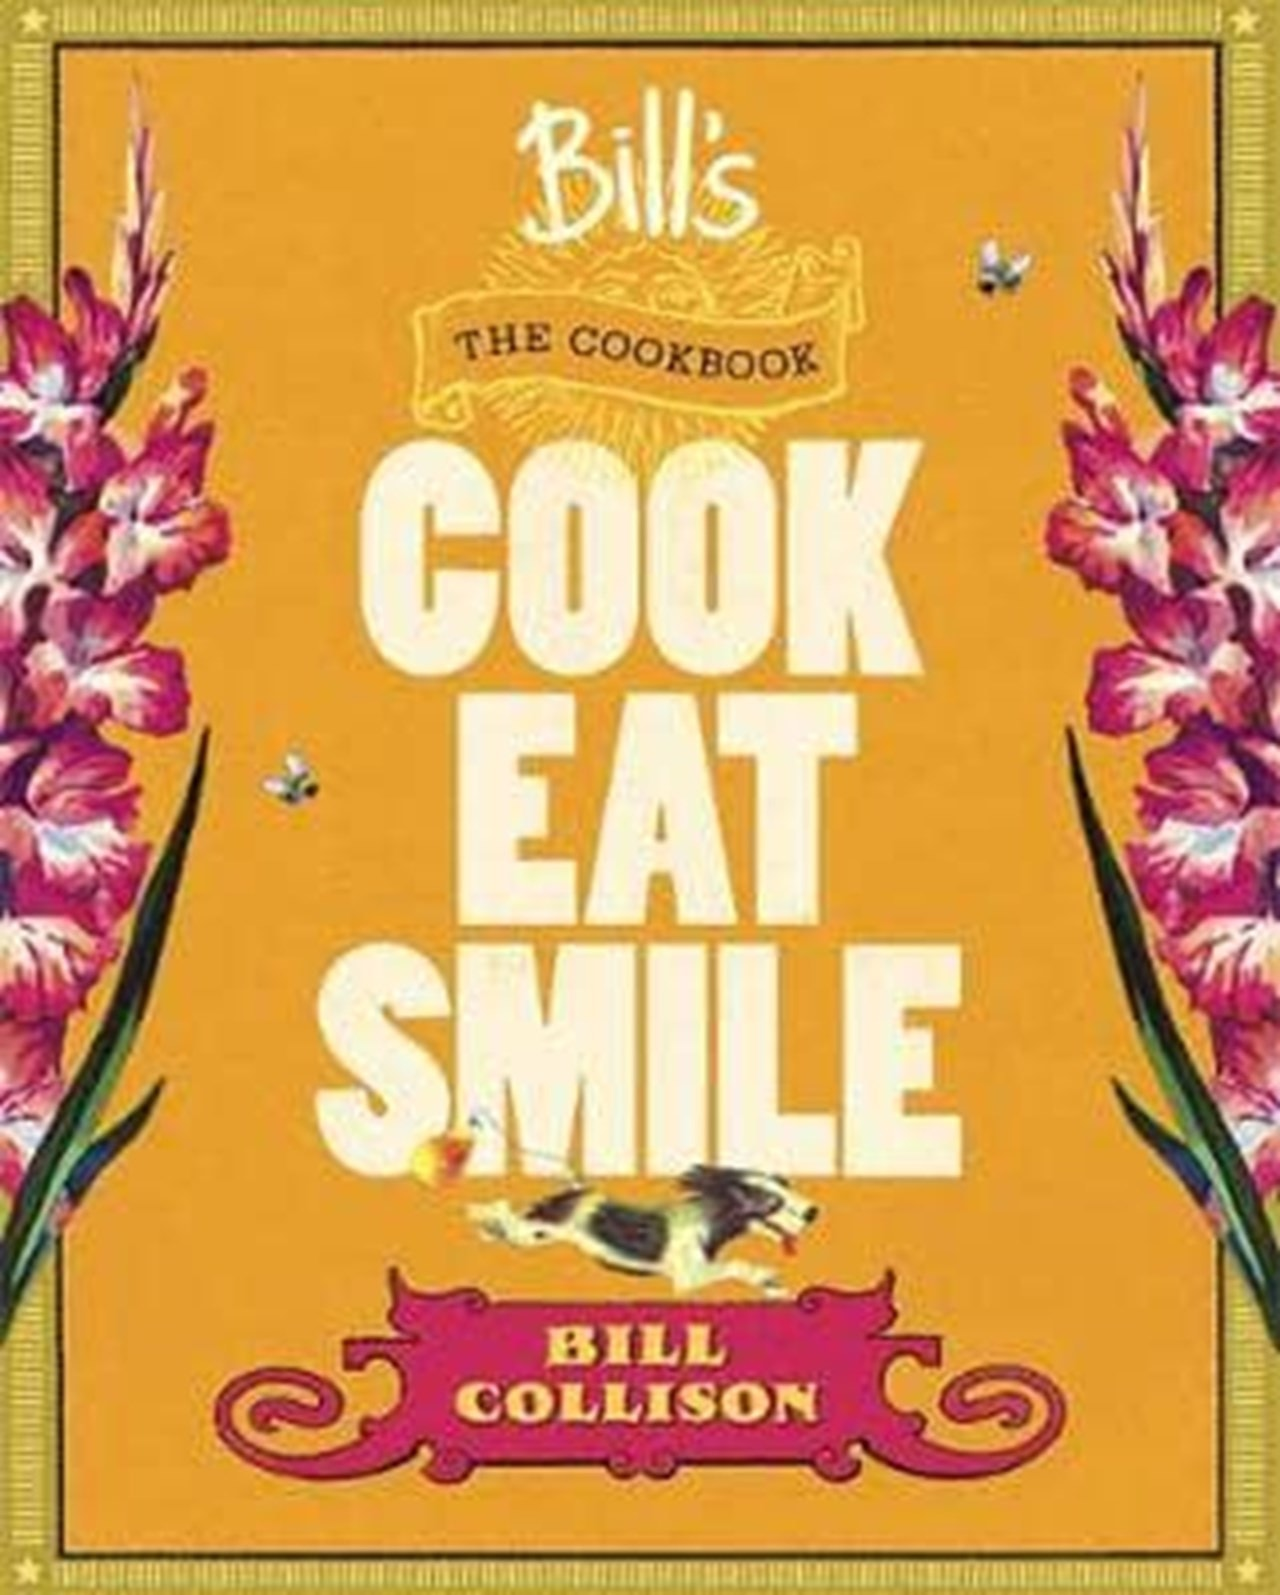 Bills: The Cookbook: Cook, Eat, Smile - 1